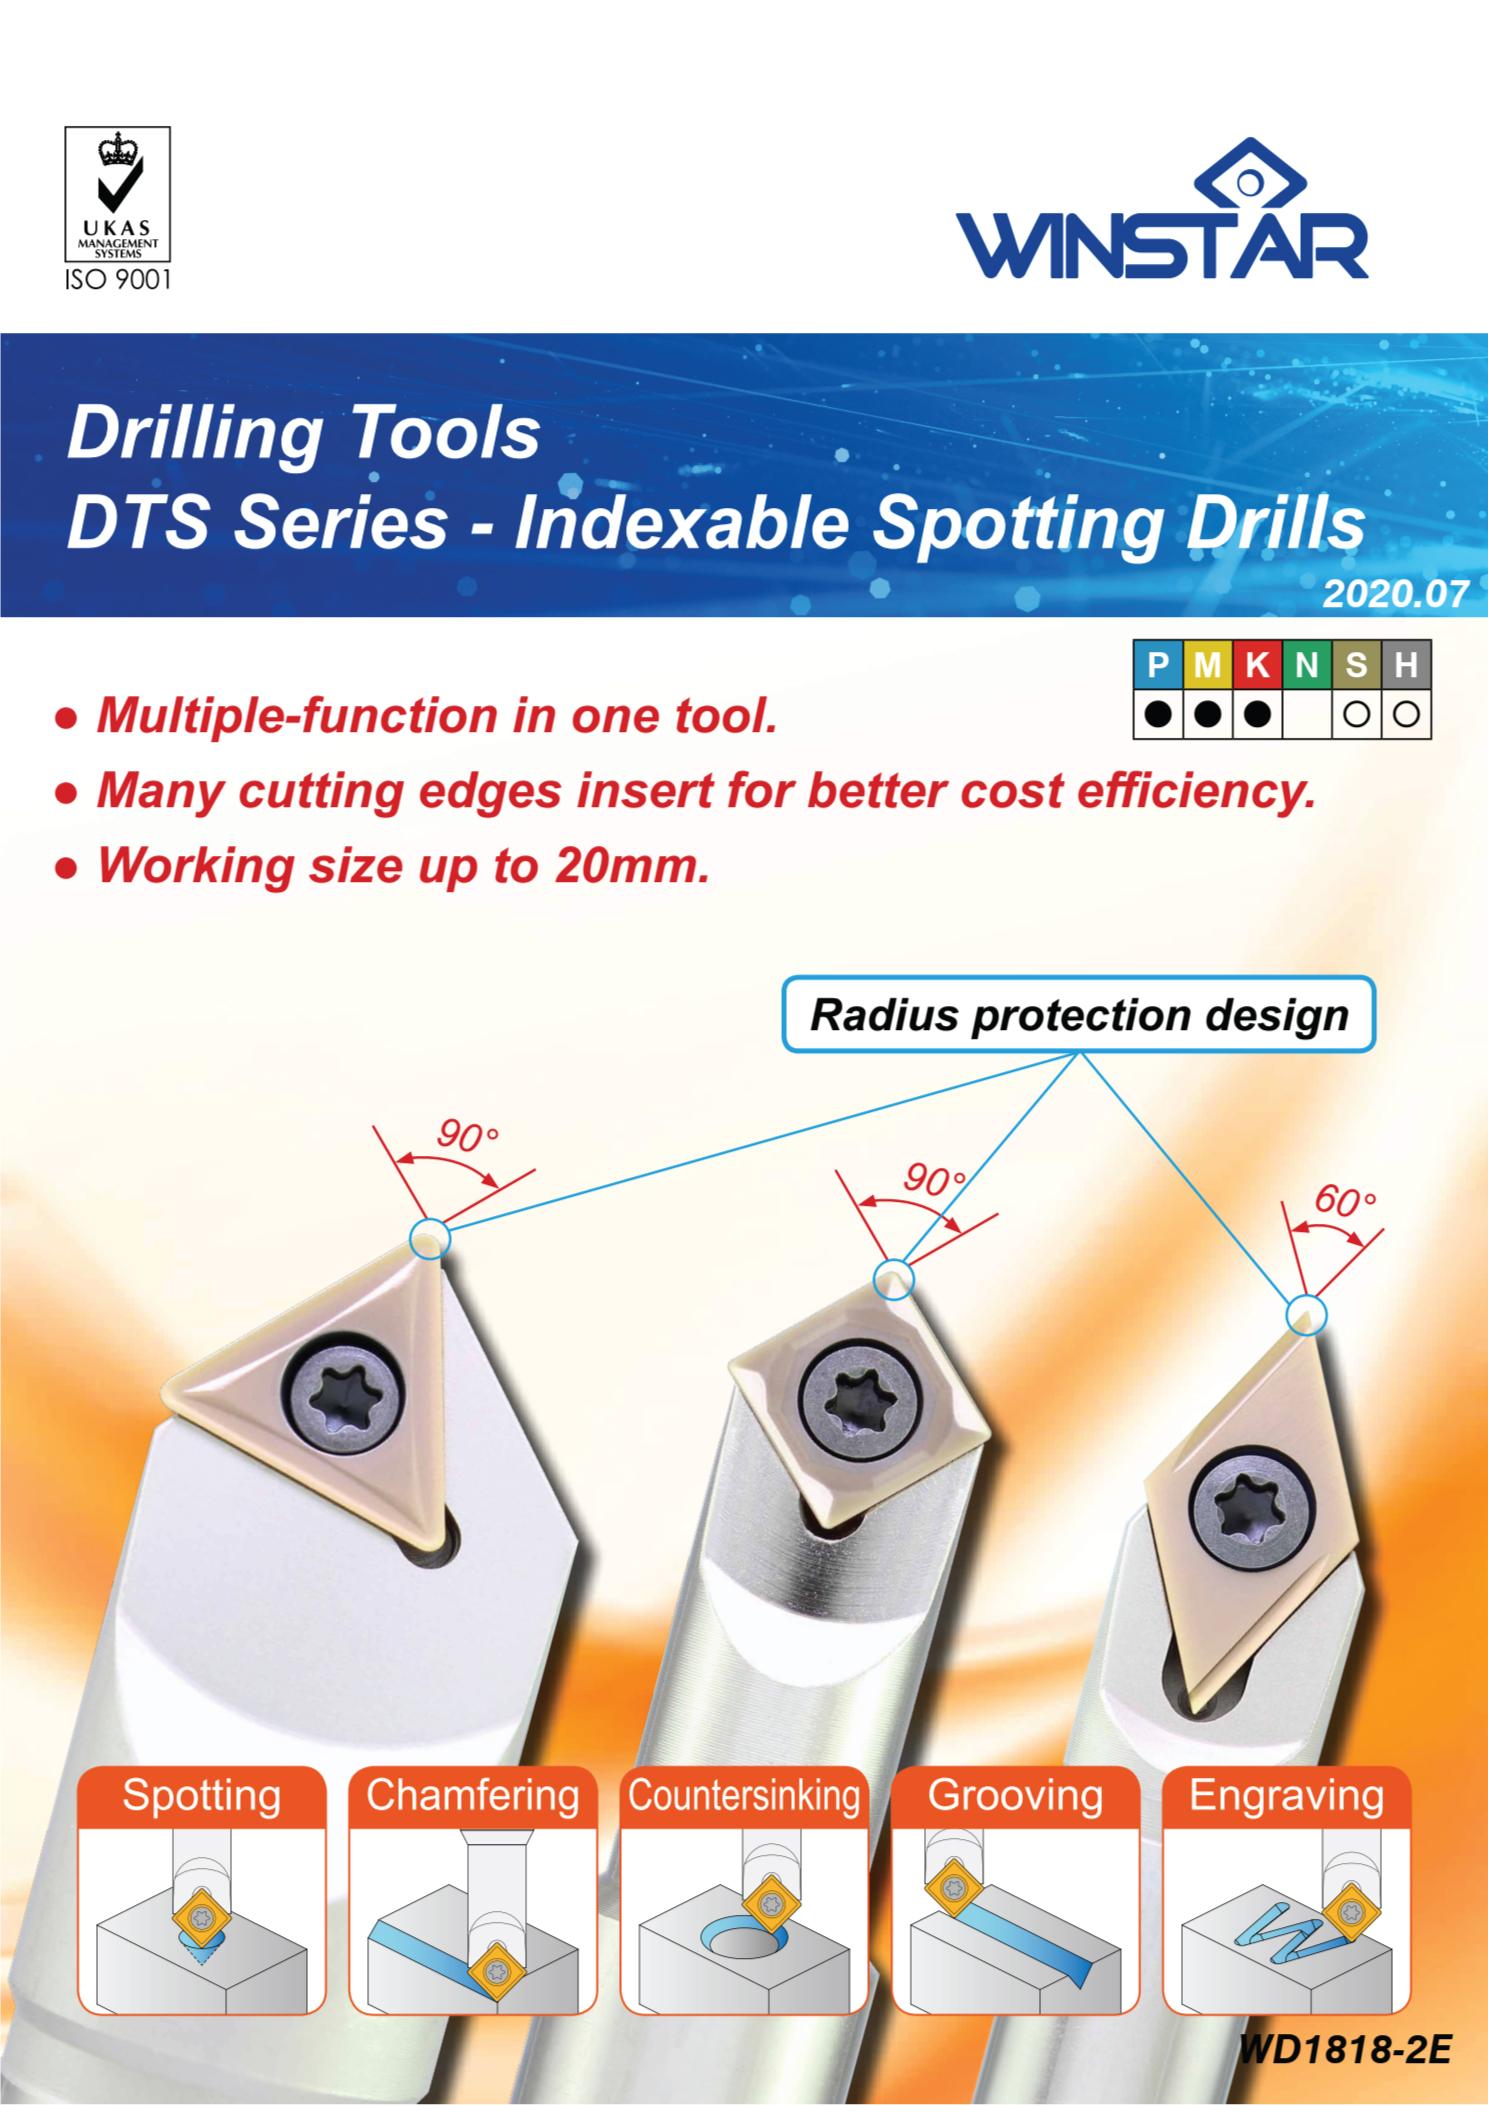 Mũi Khoan Gắn Mảnh Spotting Drill Winstar DTS60 1